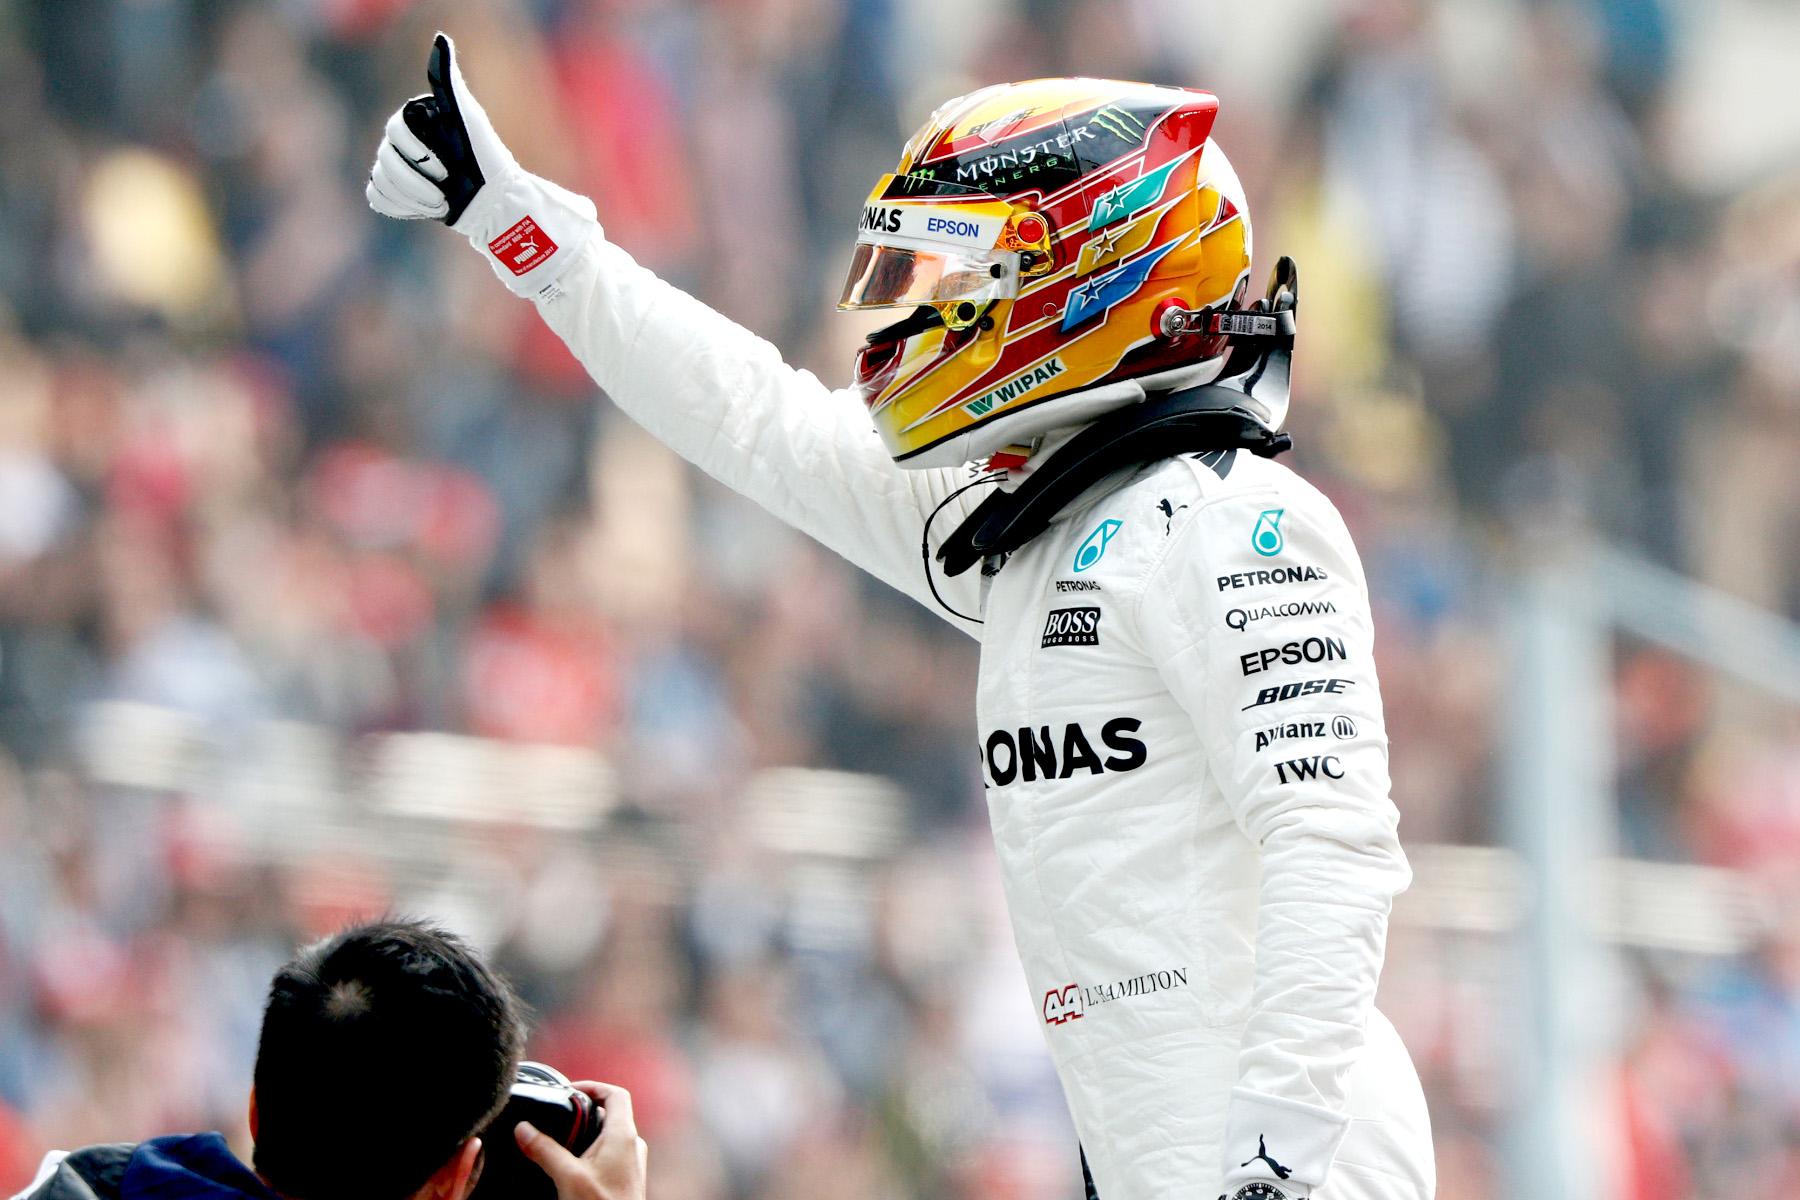 Lewis Hamilton cruises to Chinese win